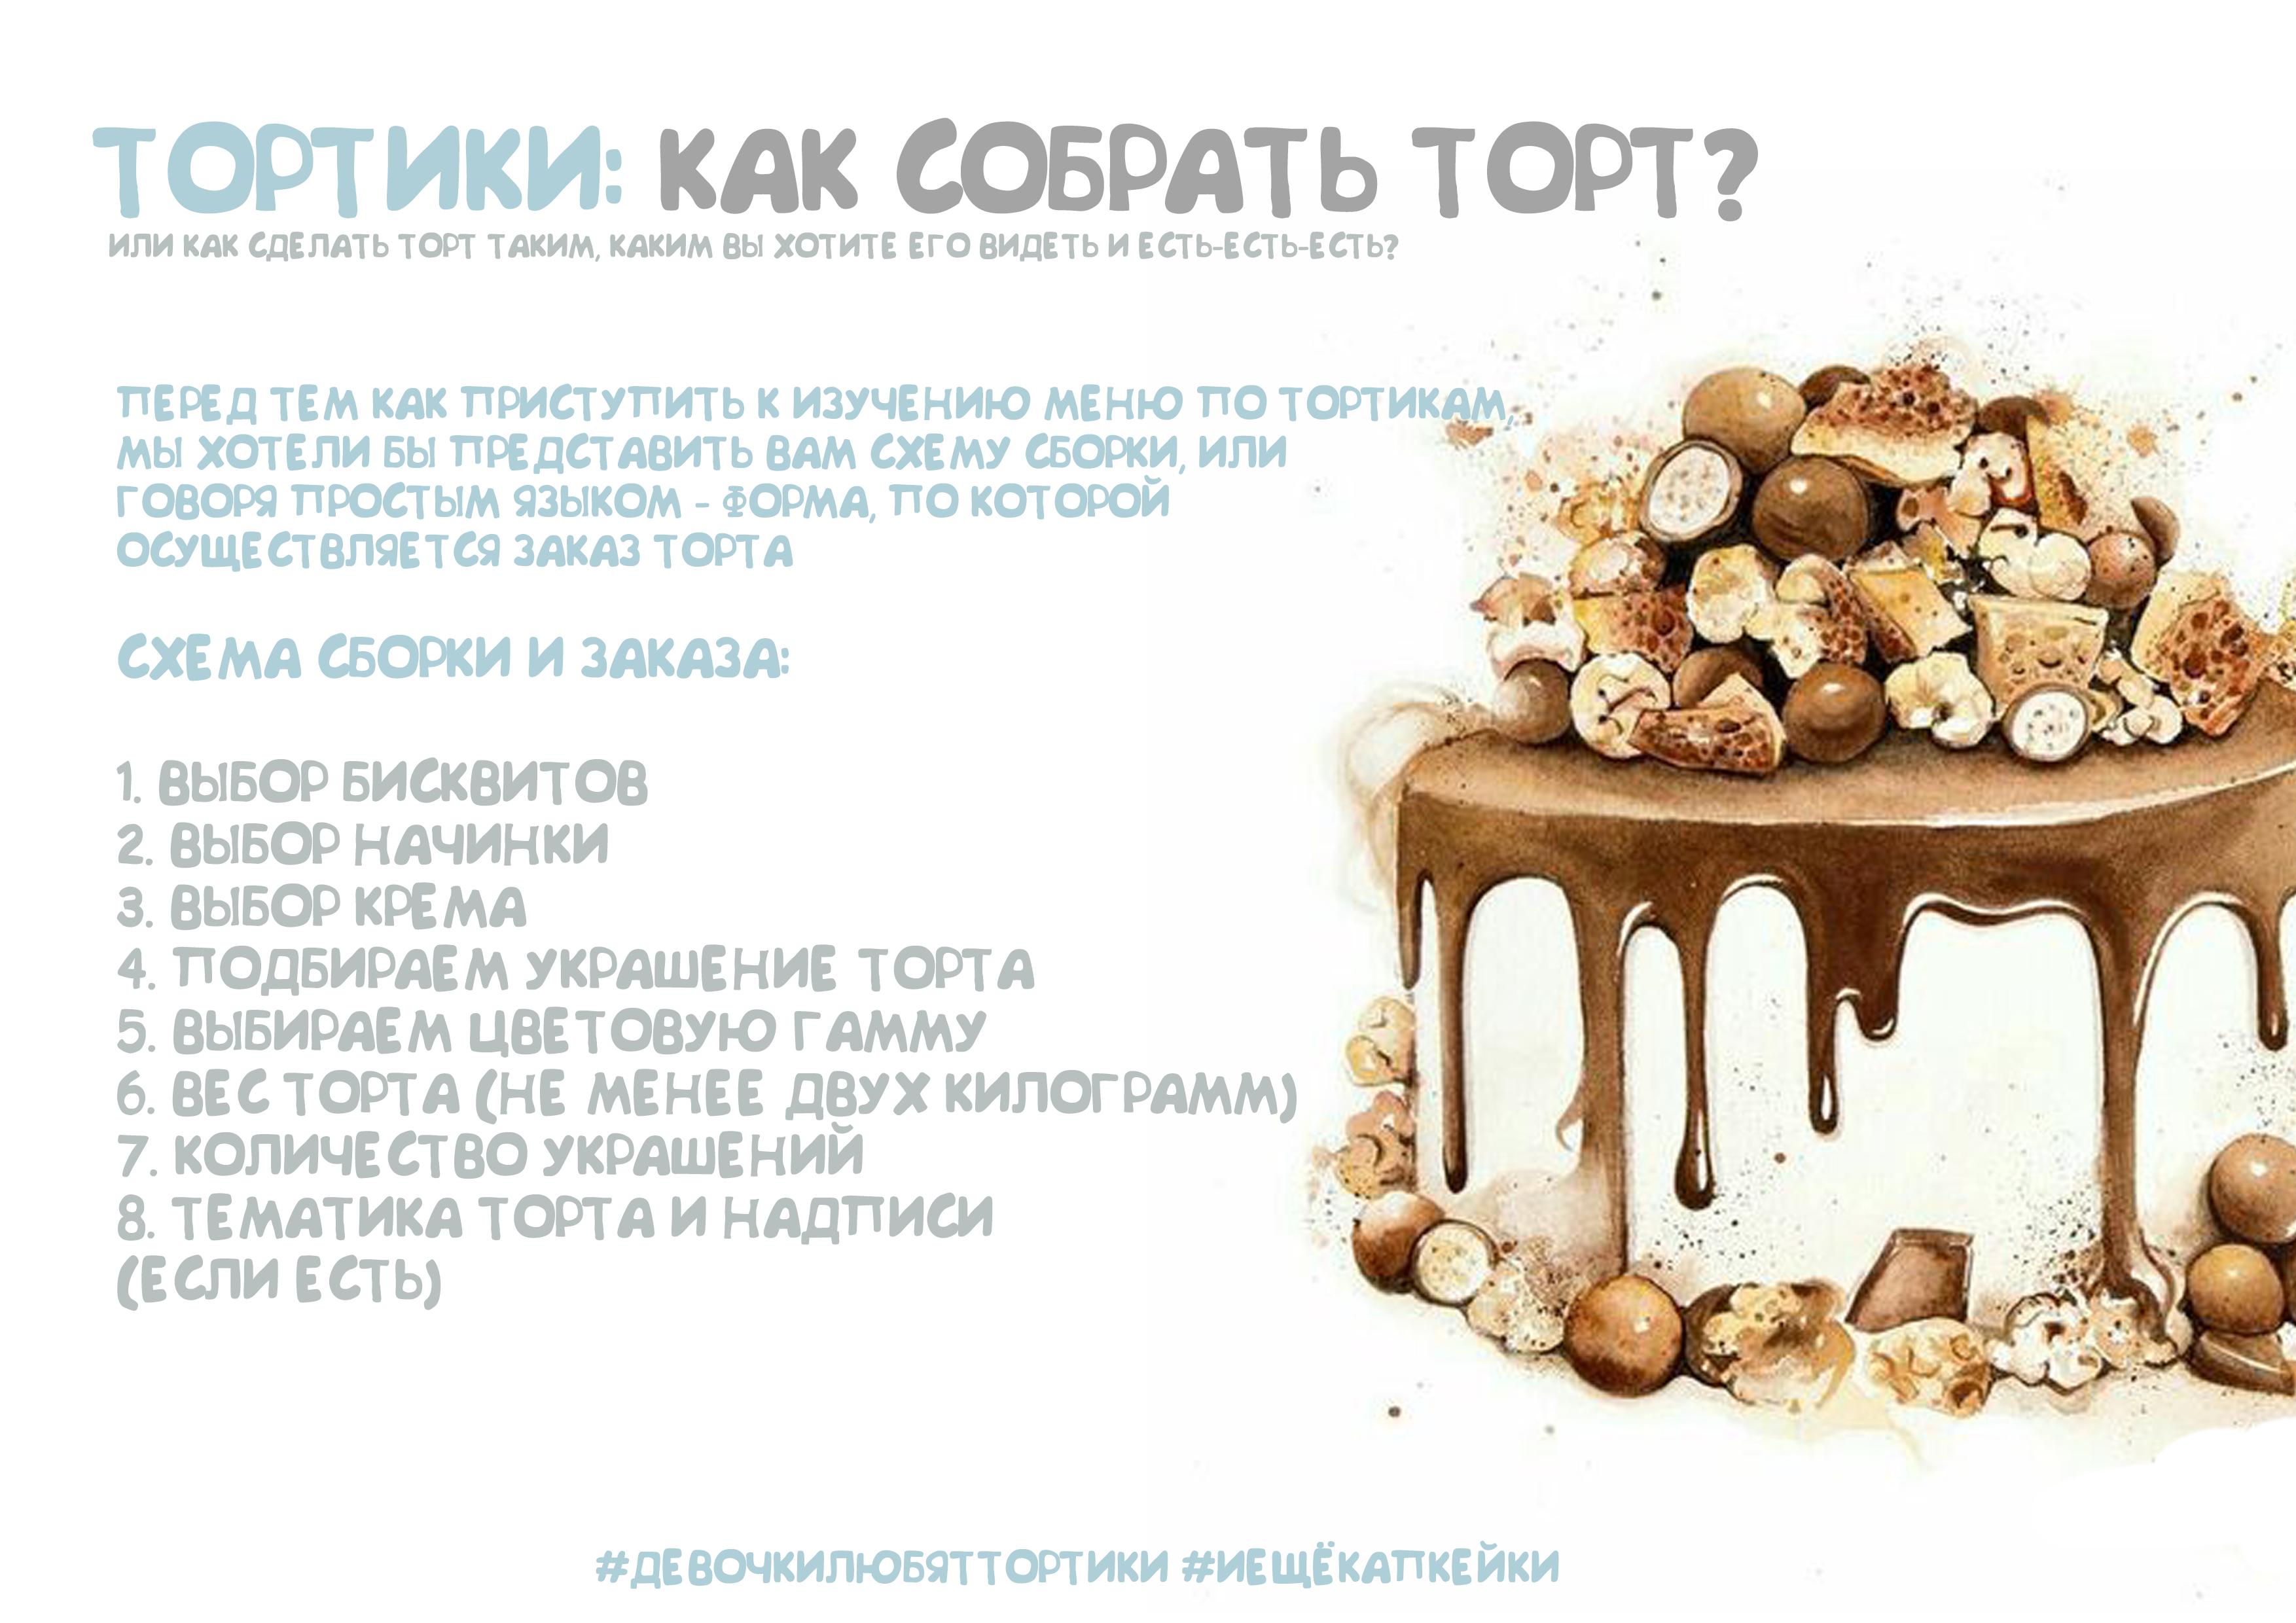 3 - cakes, main info